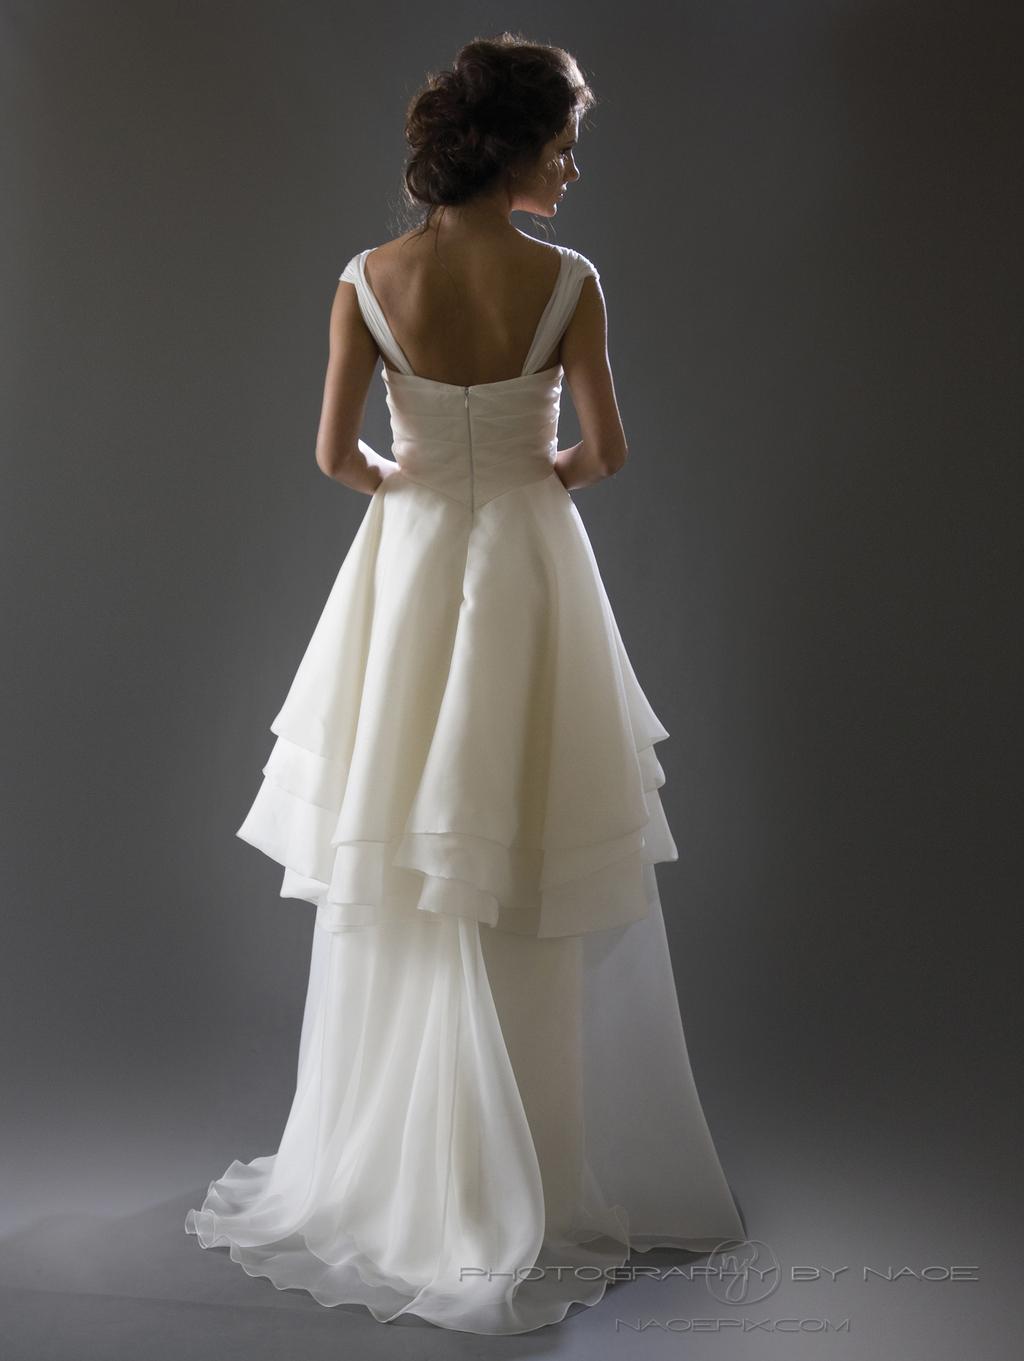 Wedding-dress-spring-2013-bridal_gown-cocoe-voci-13-back.full